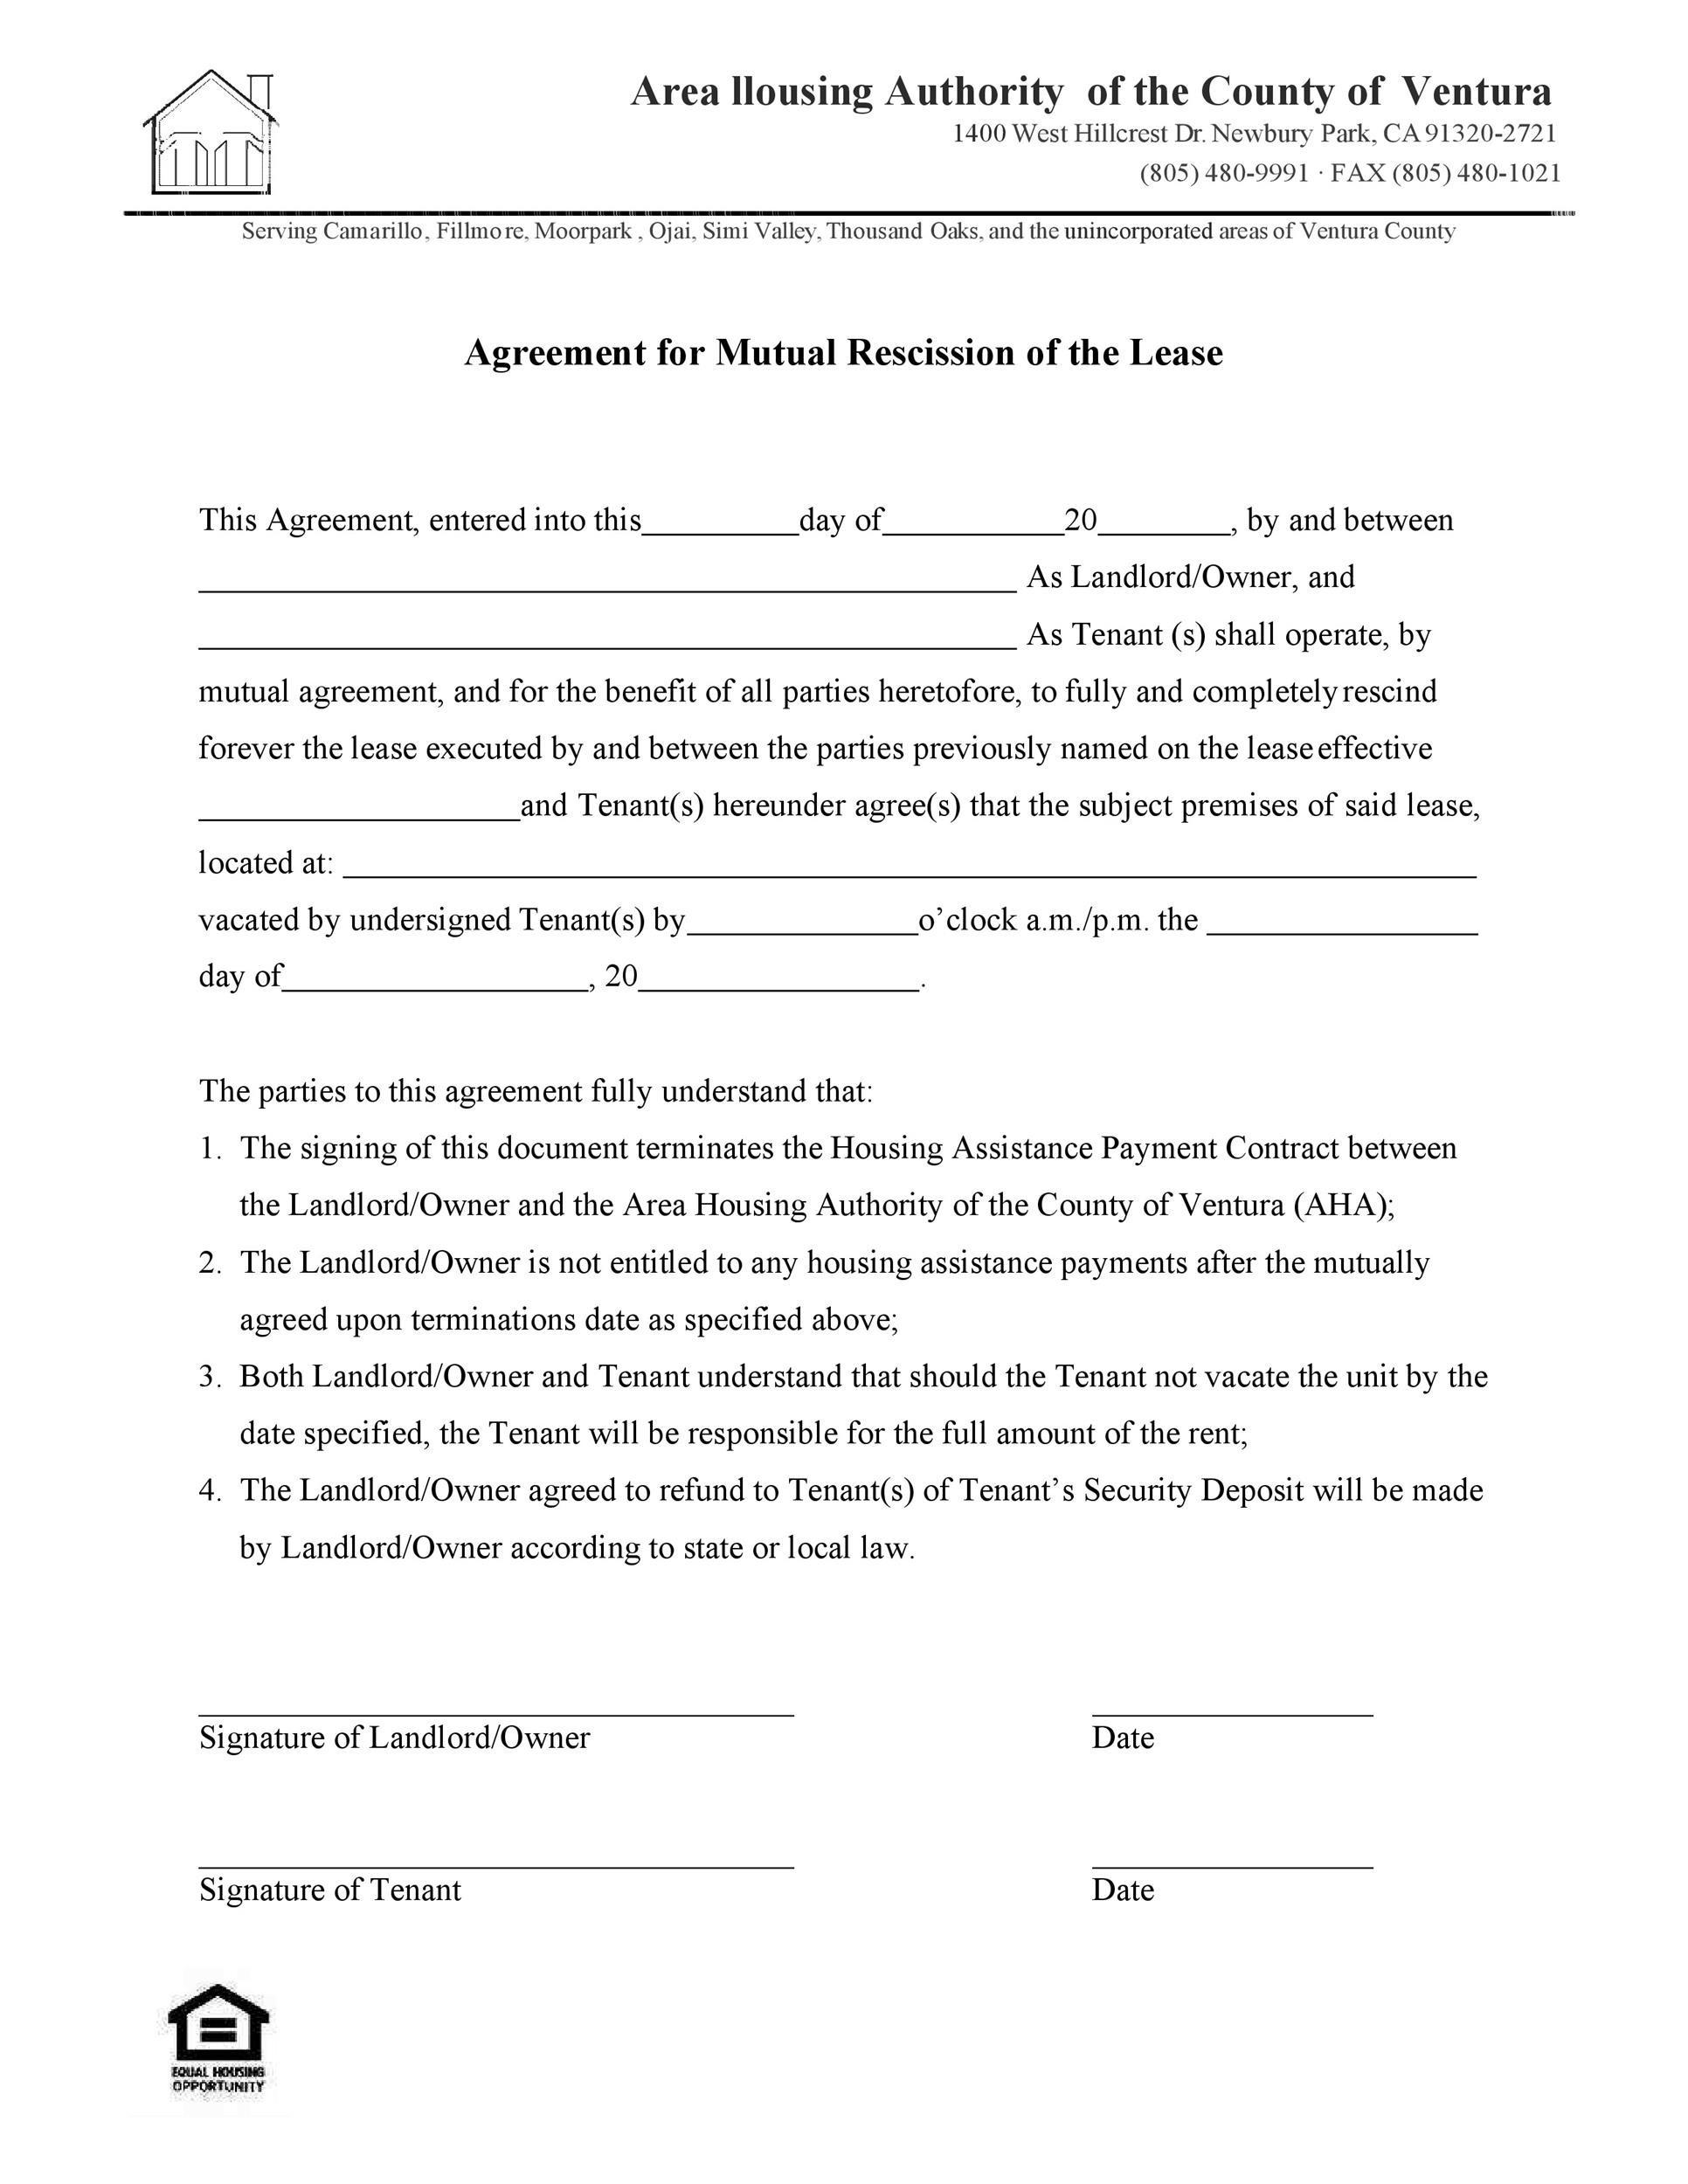 Free rescission agreement 14